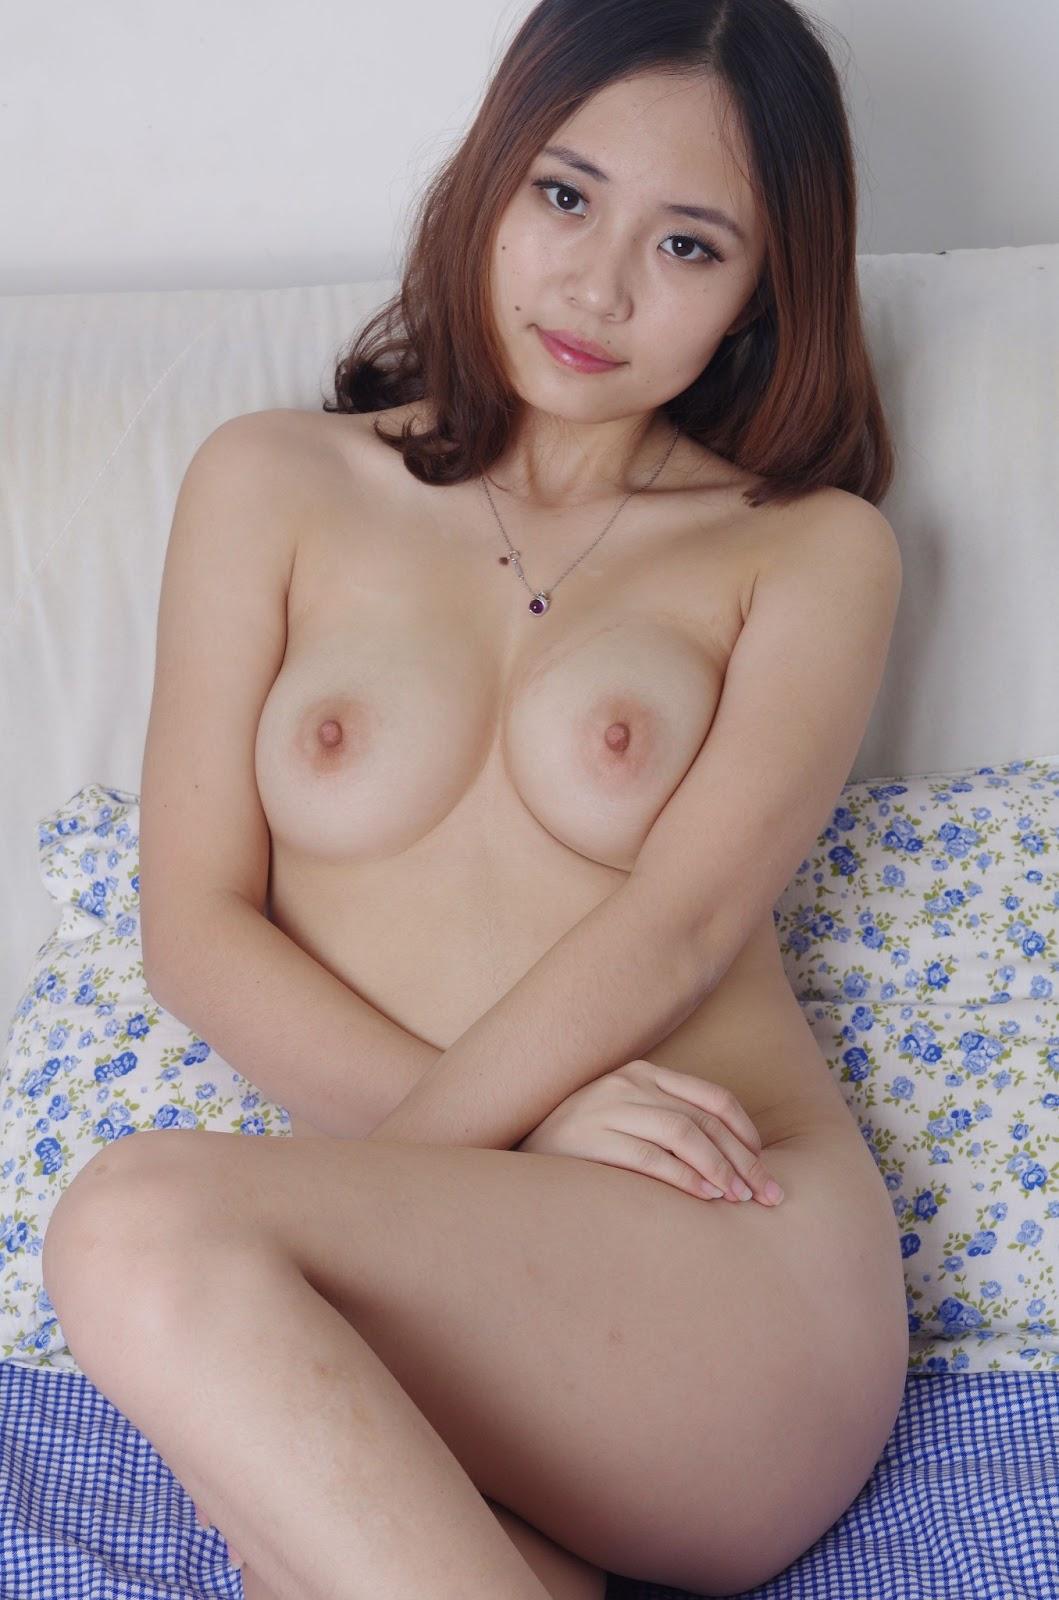 Cute Girl Nude Dance